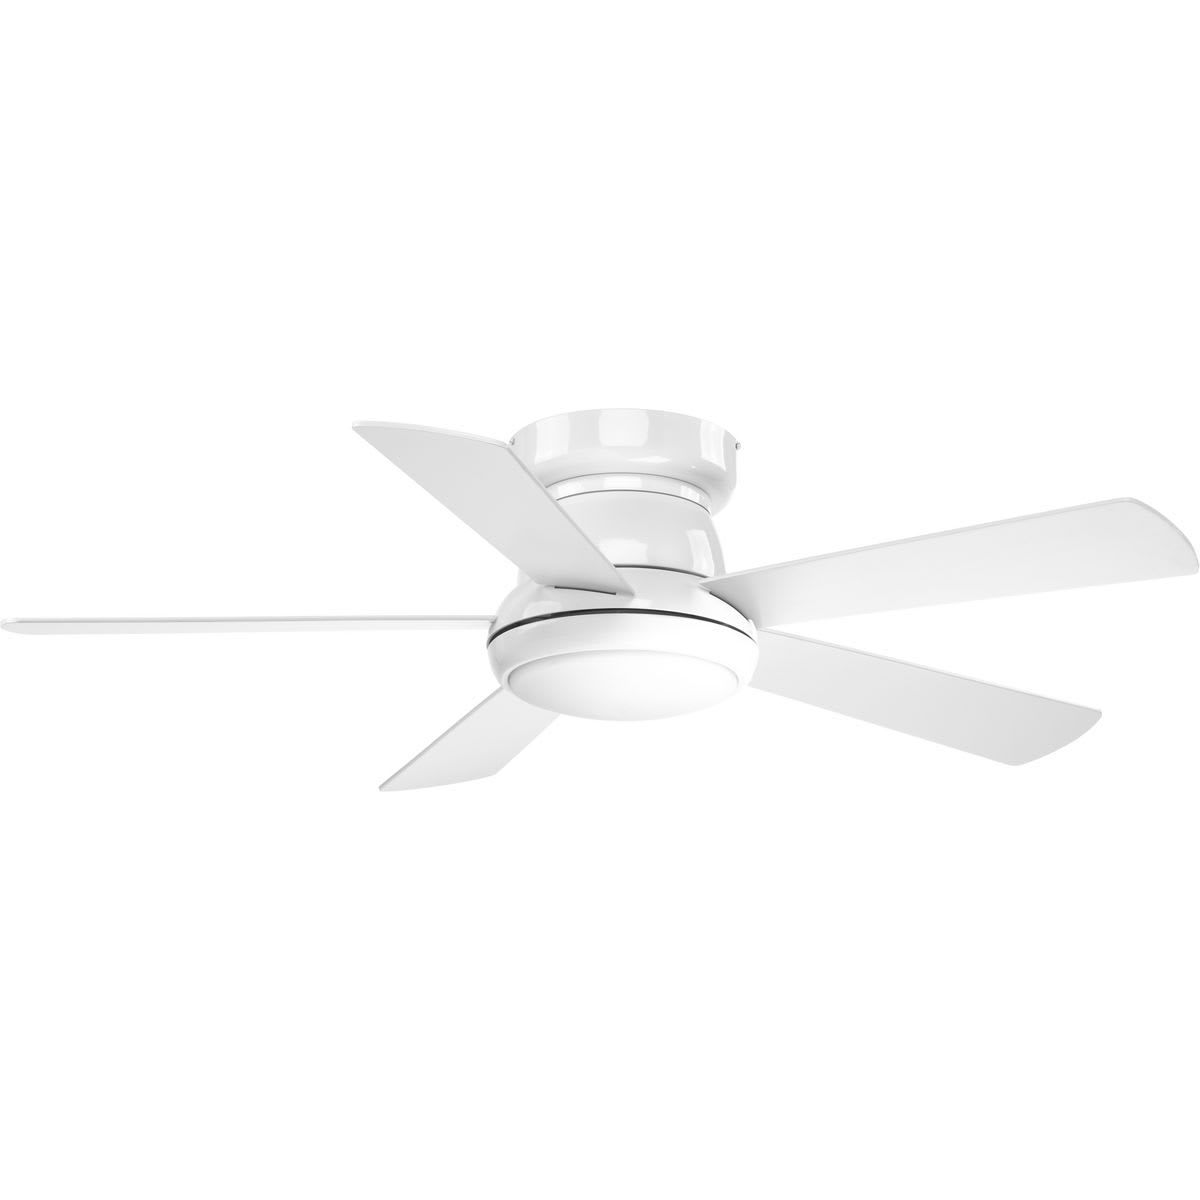 Progress Lighting P2572 3030k White Vox 52 5 Blade Hugger Ceiling Fan With Led Light Kit And Remote Faucet Com